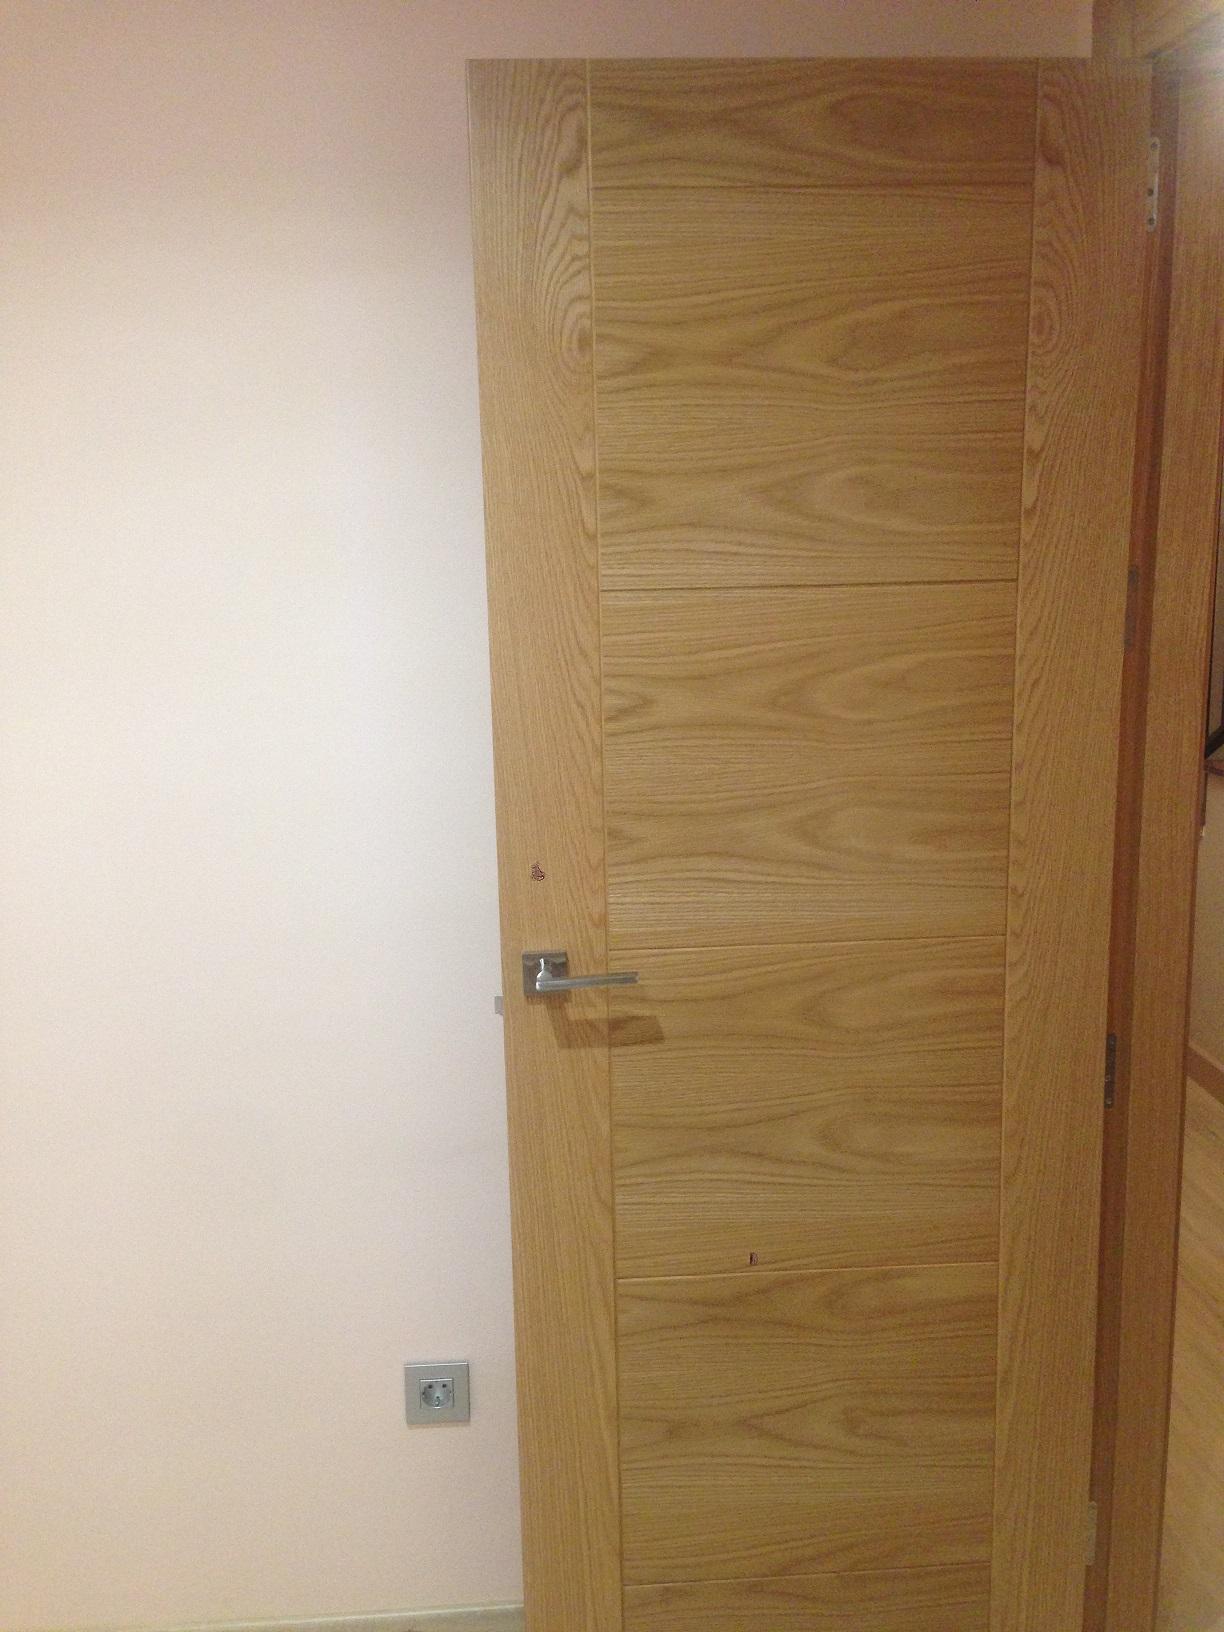 Empresa de puertas a medida en granada carpinteria for Puertas a medida